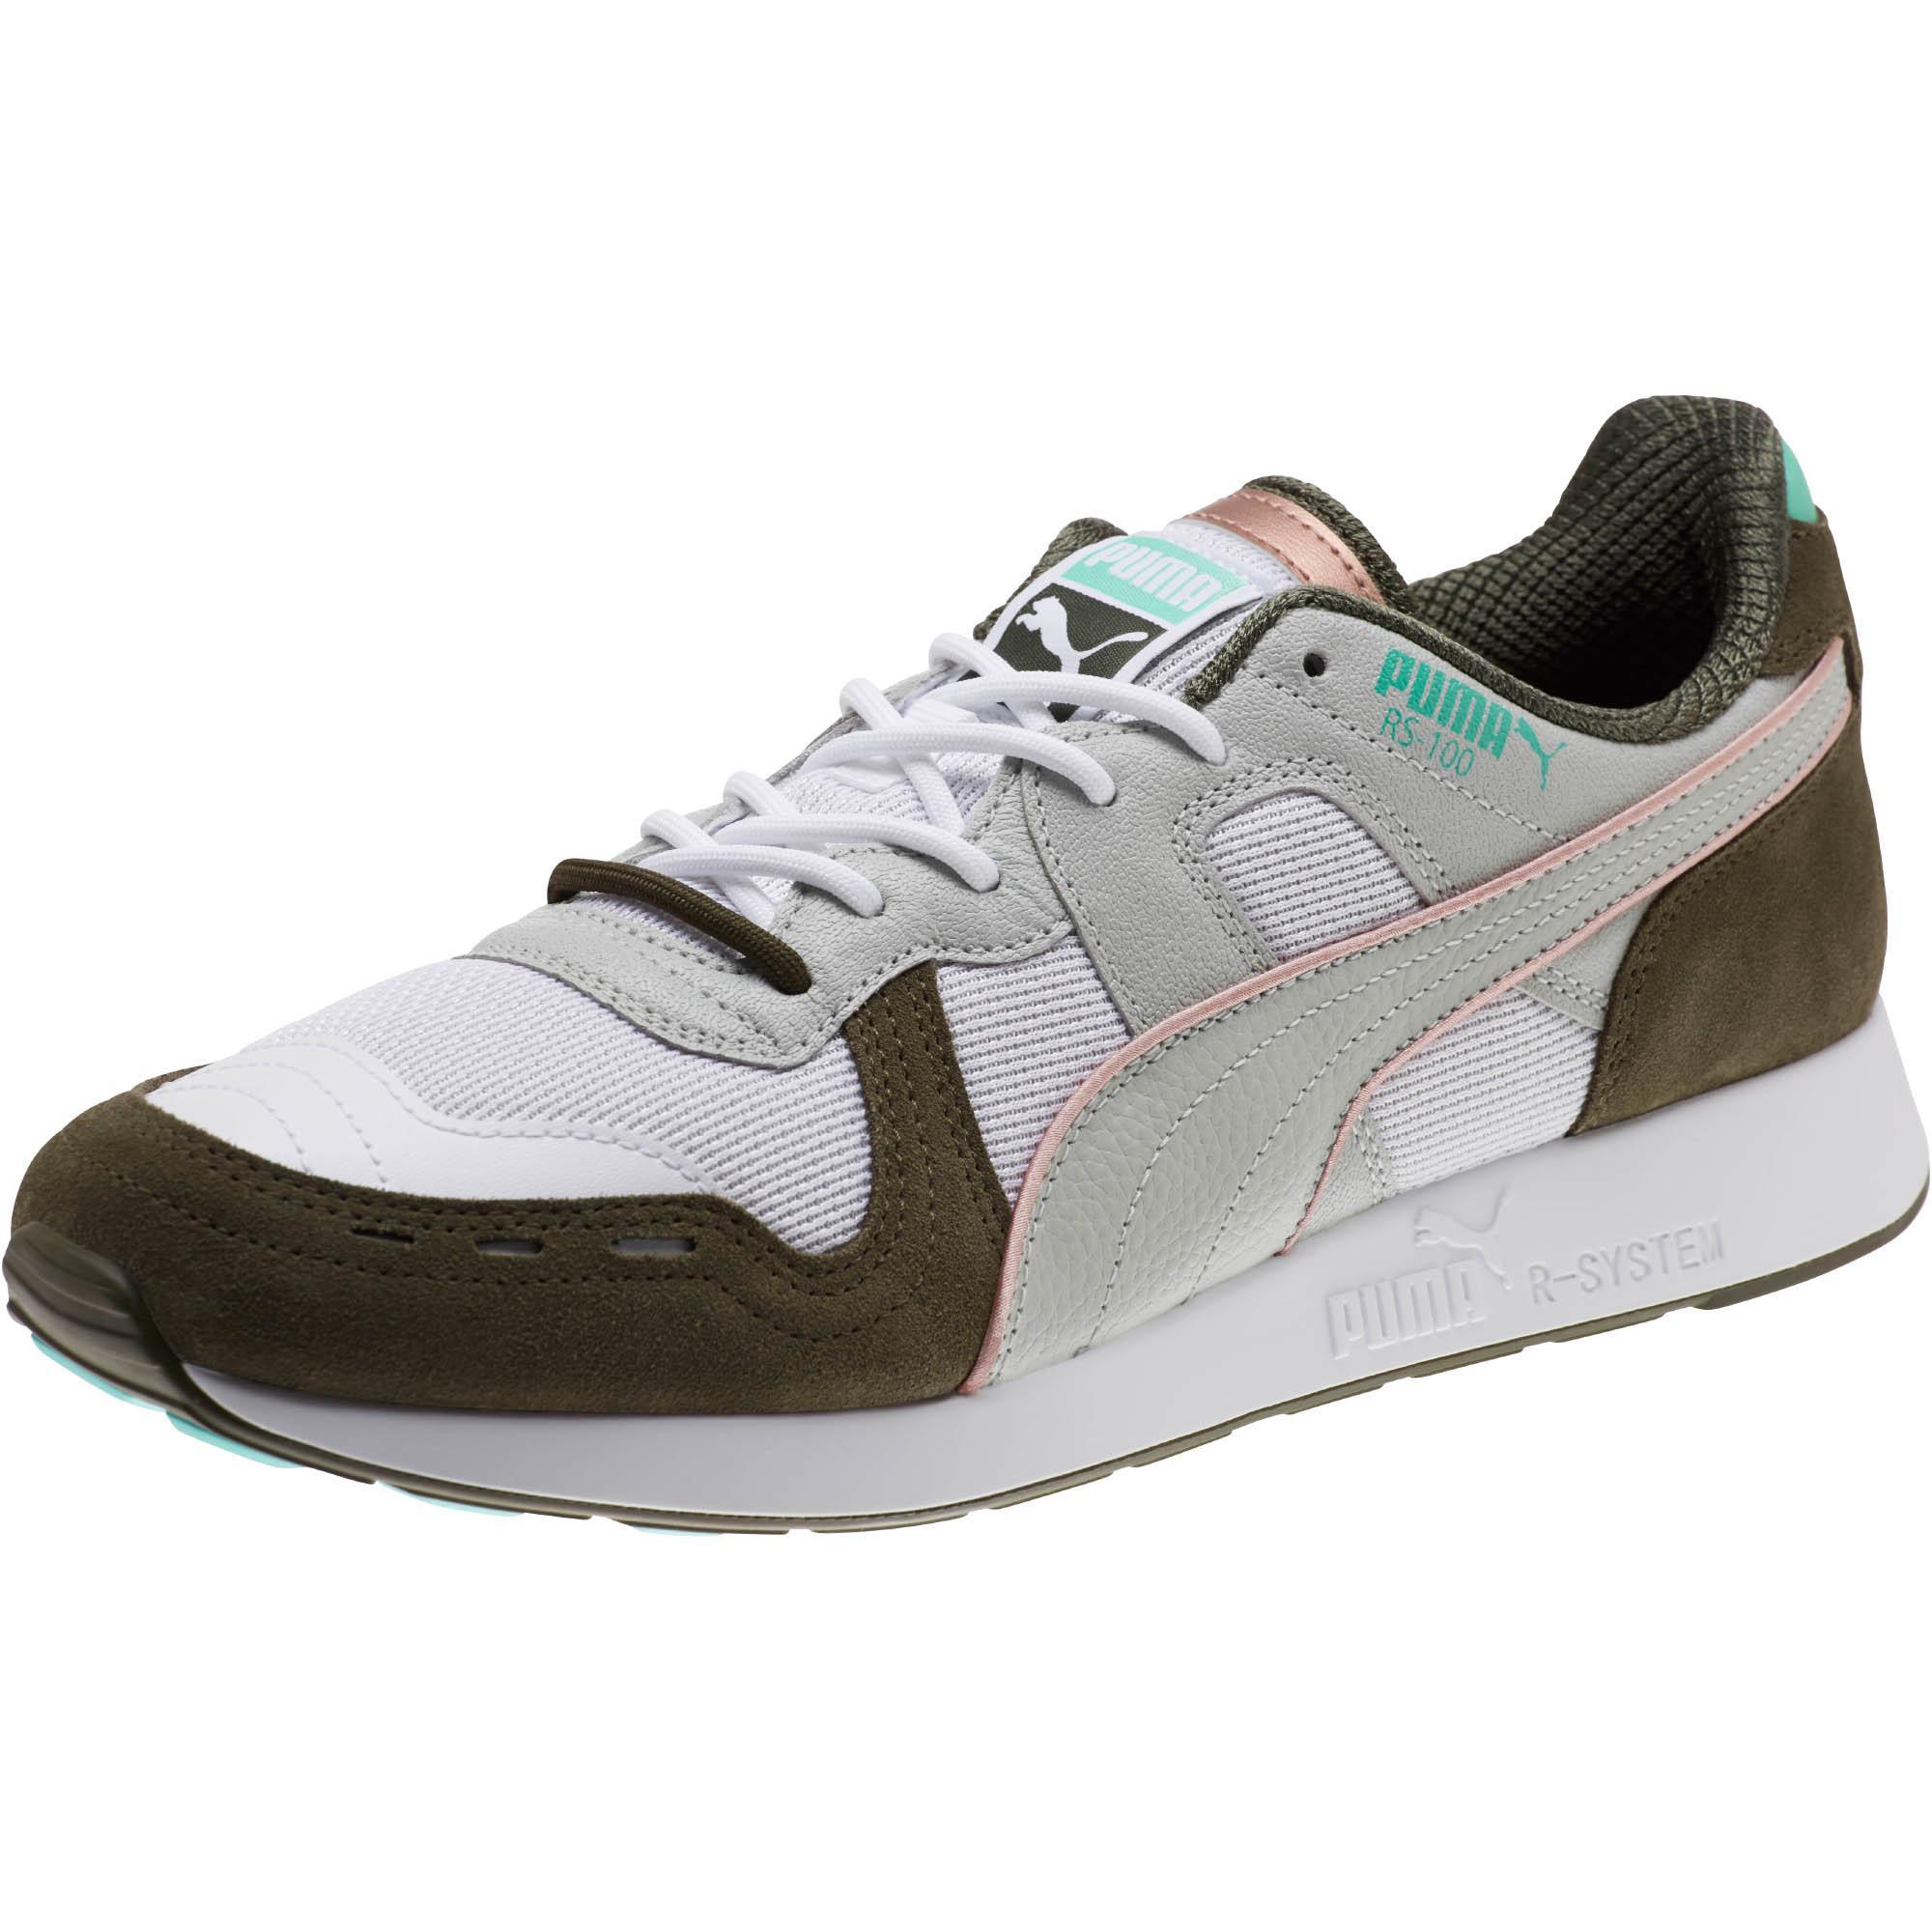 af6ad605883 PUMA Multicolor X Emory Jones Rs-100 Sneakers for men